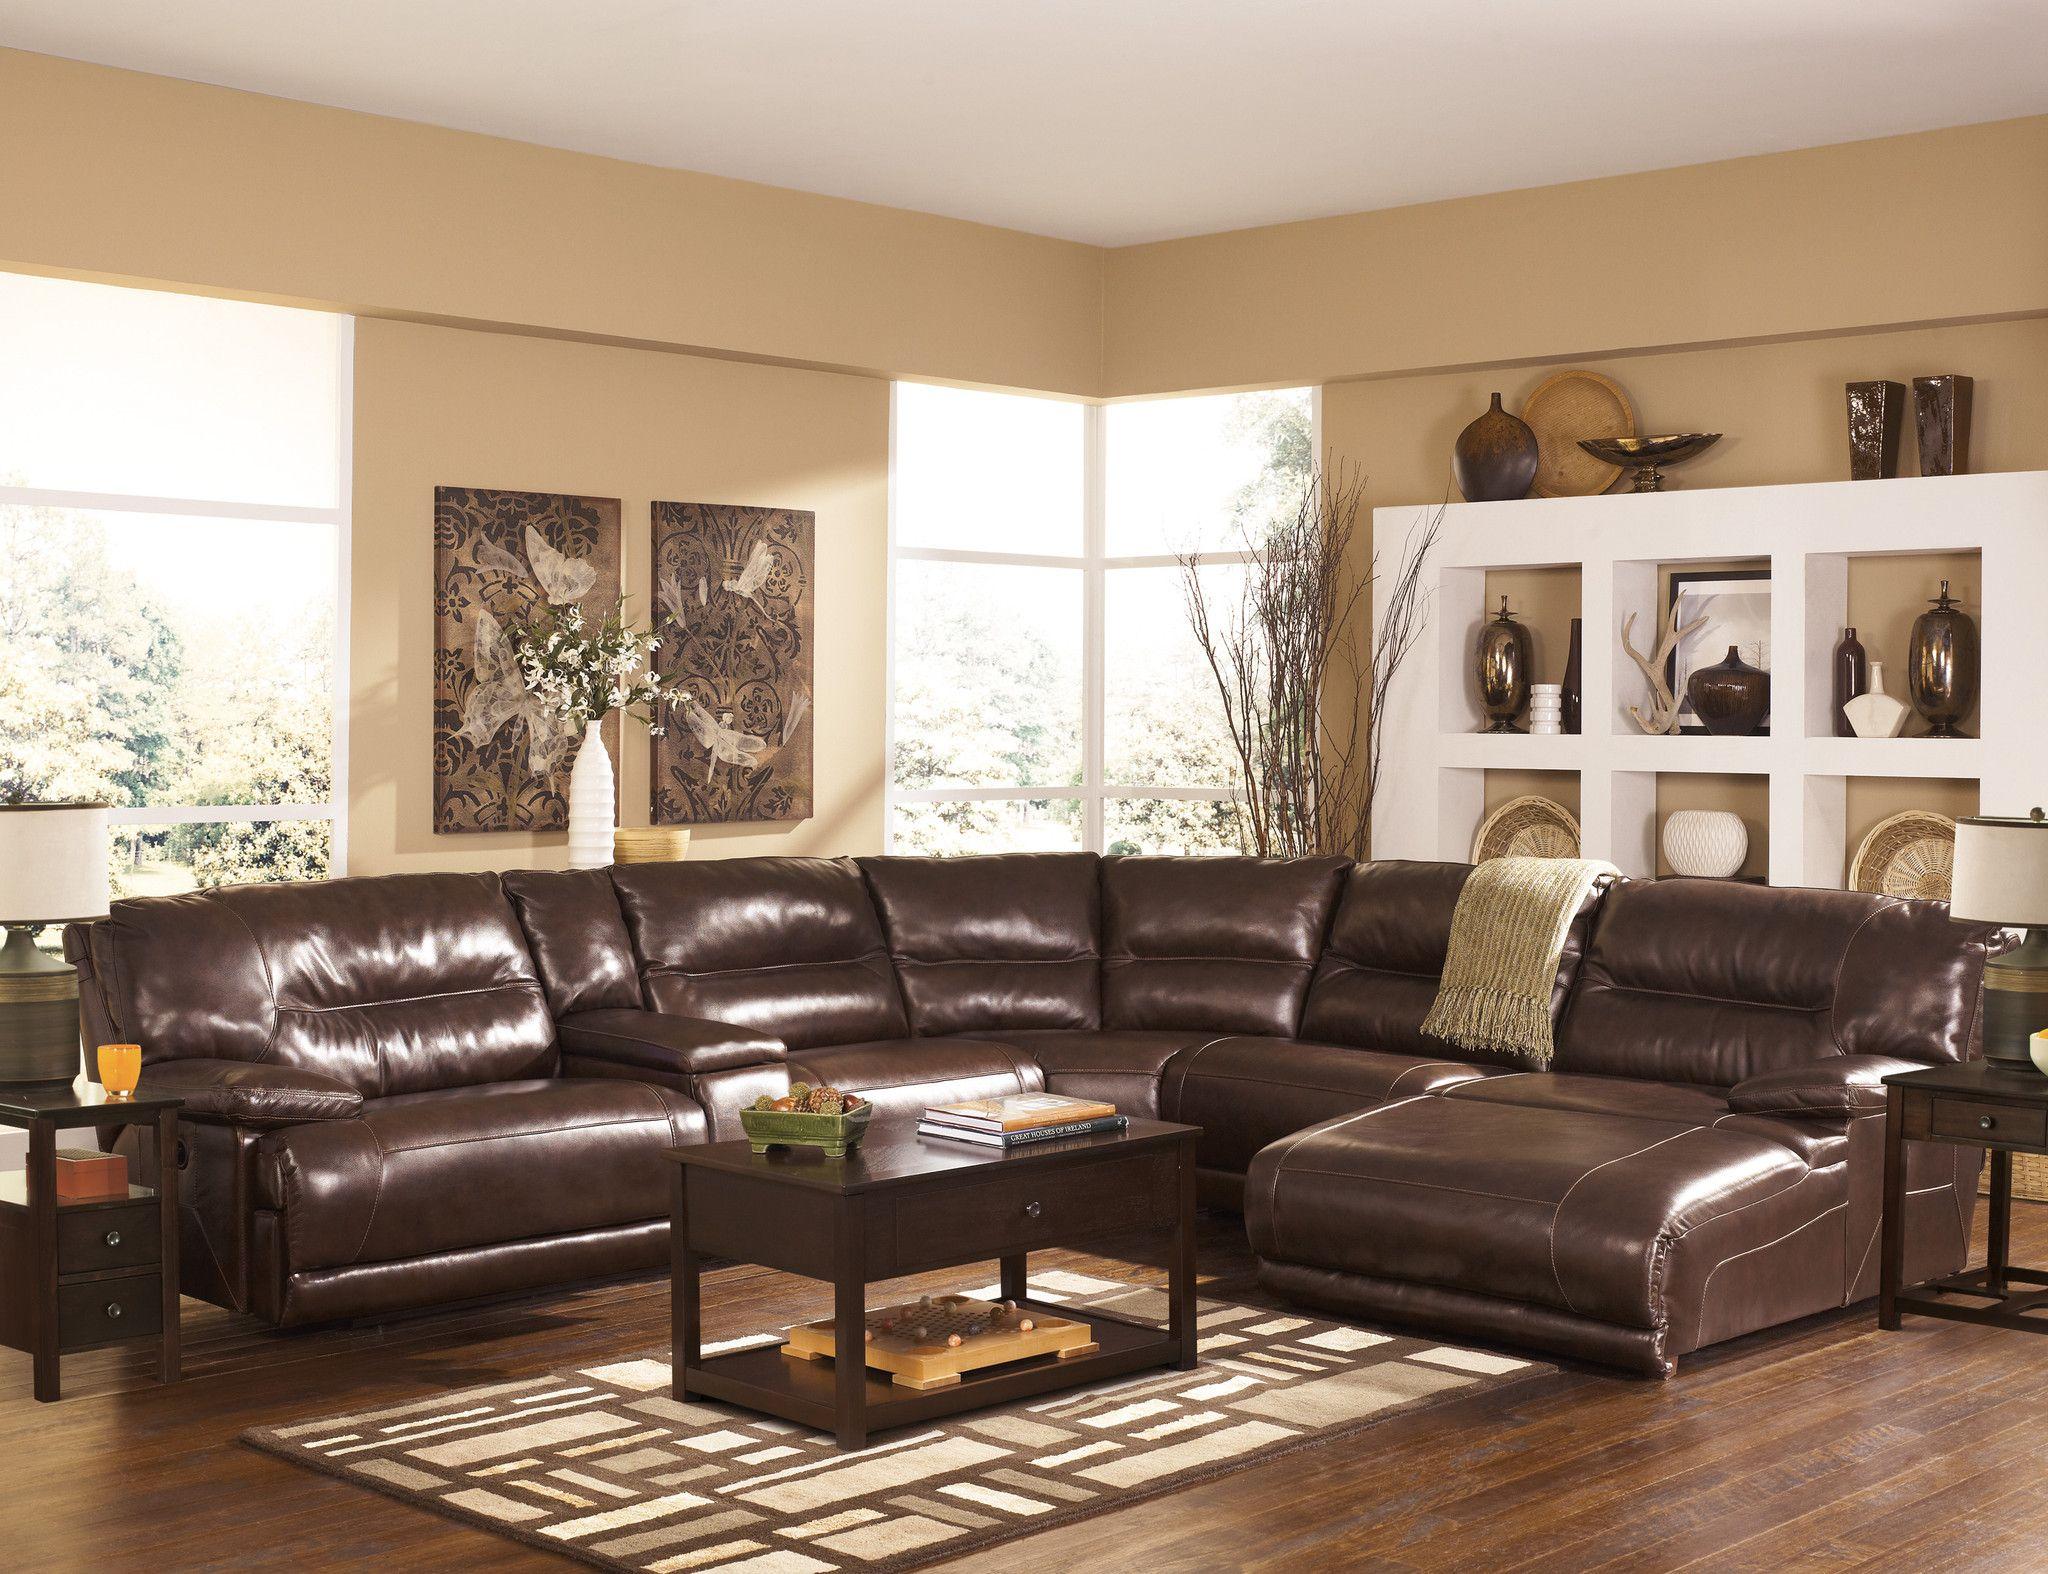 Description Dimensions More Info Ashley Furniture Exhilaration